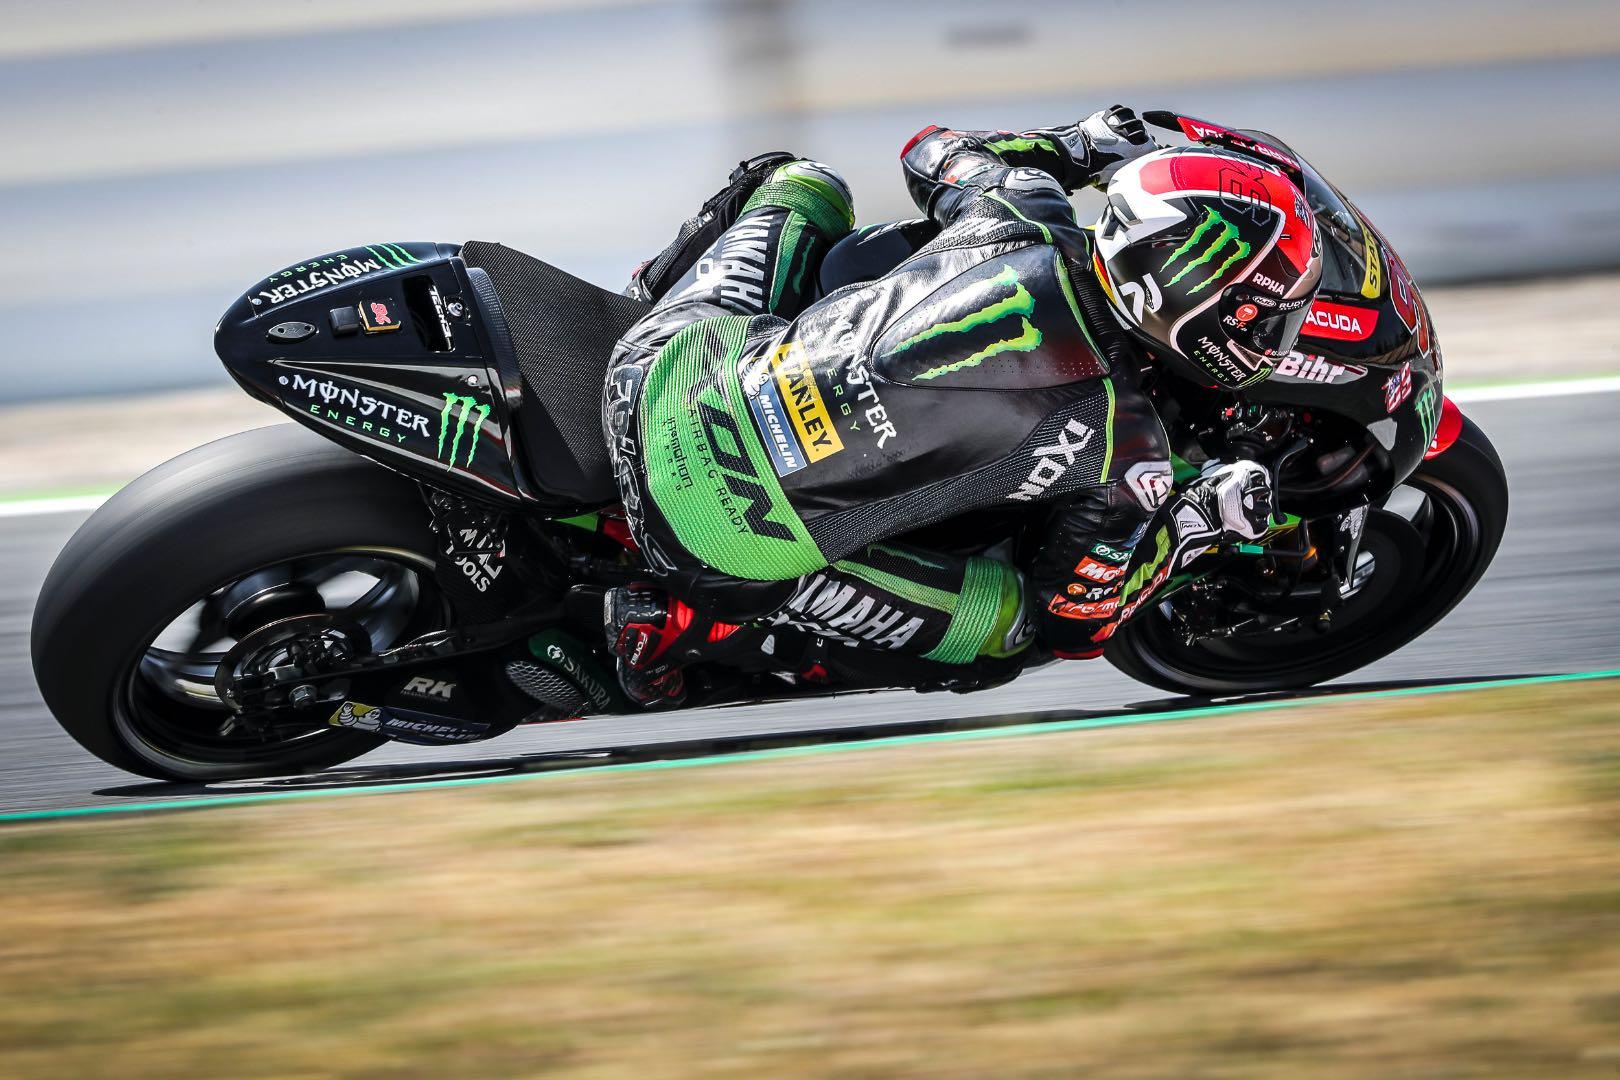 2017 Catalunya MotoGP Test: Yamaha's Jonas Folger